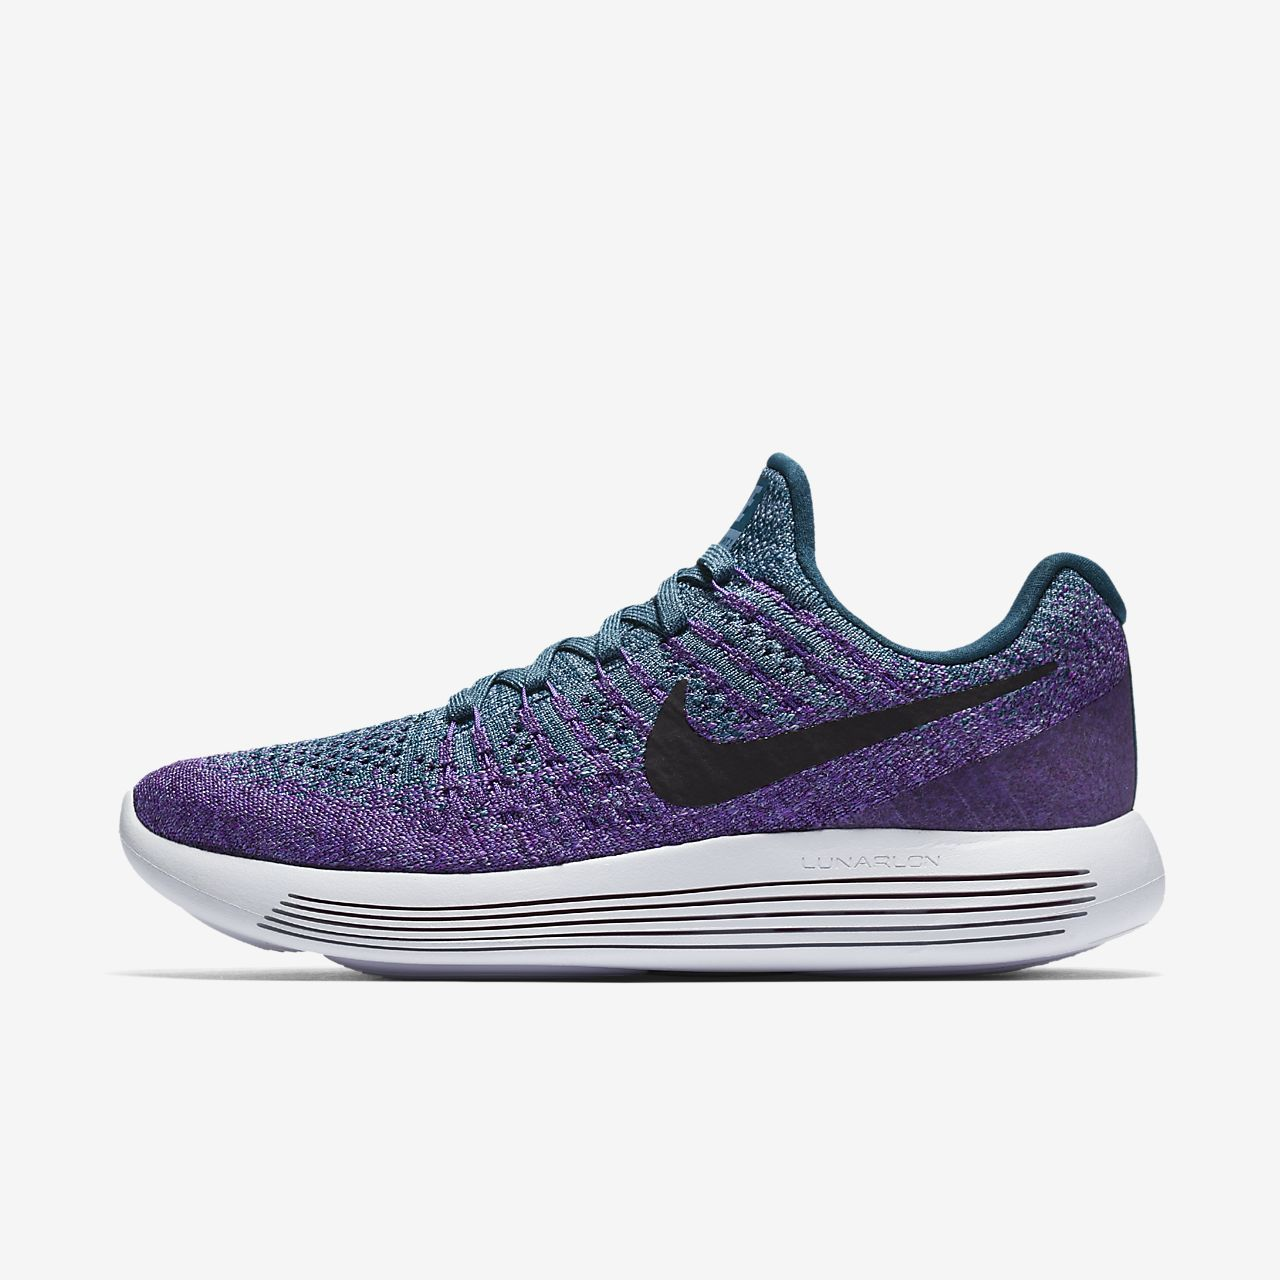 bc3212292449 Nike LunarEpic Low Flyknit 2 Women s Running Shoe size 9.5